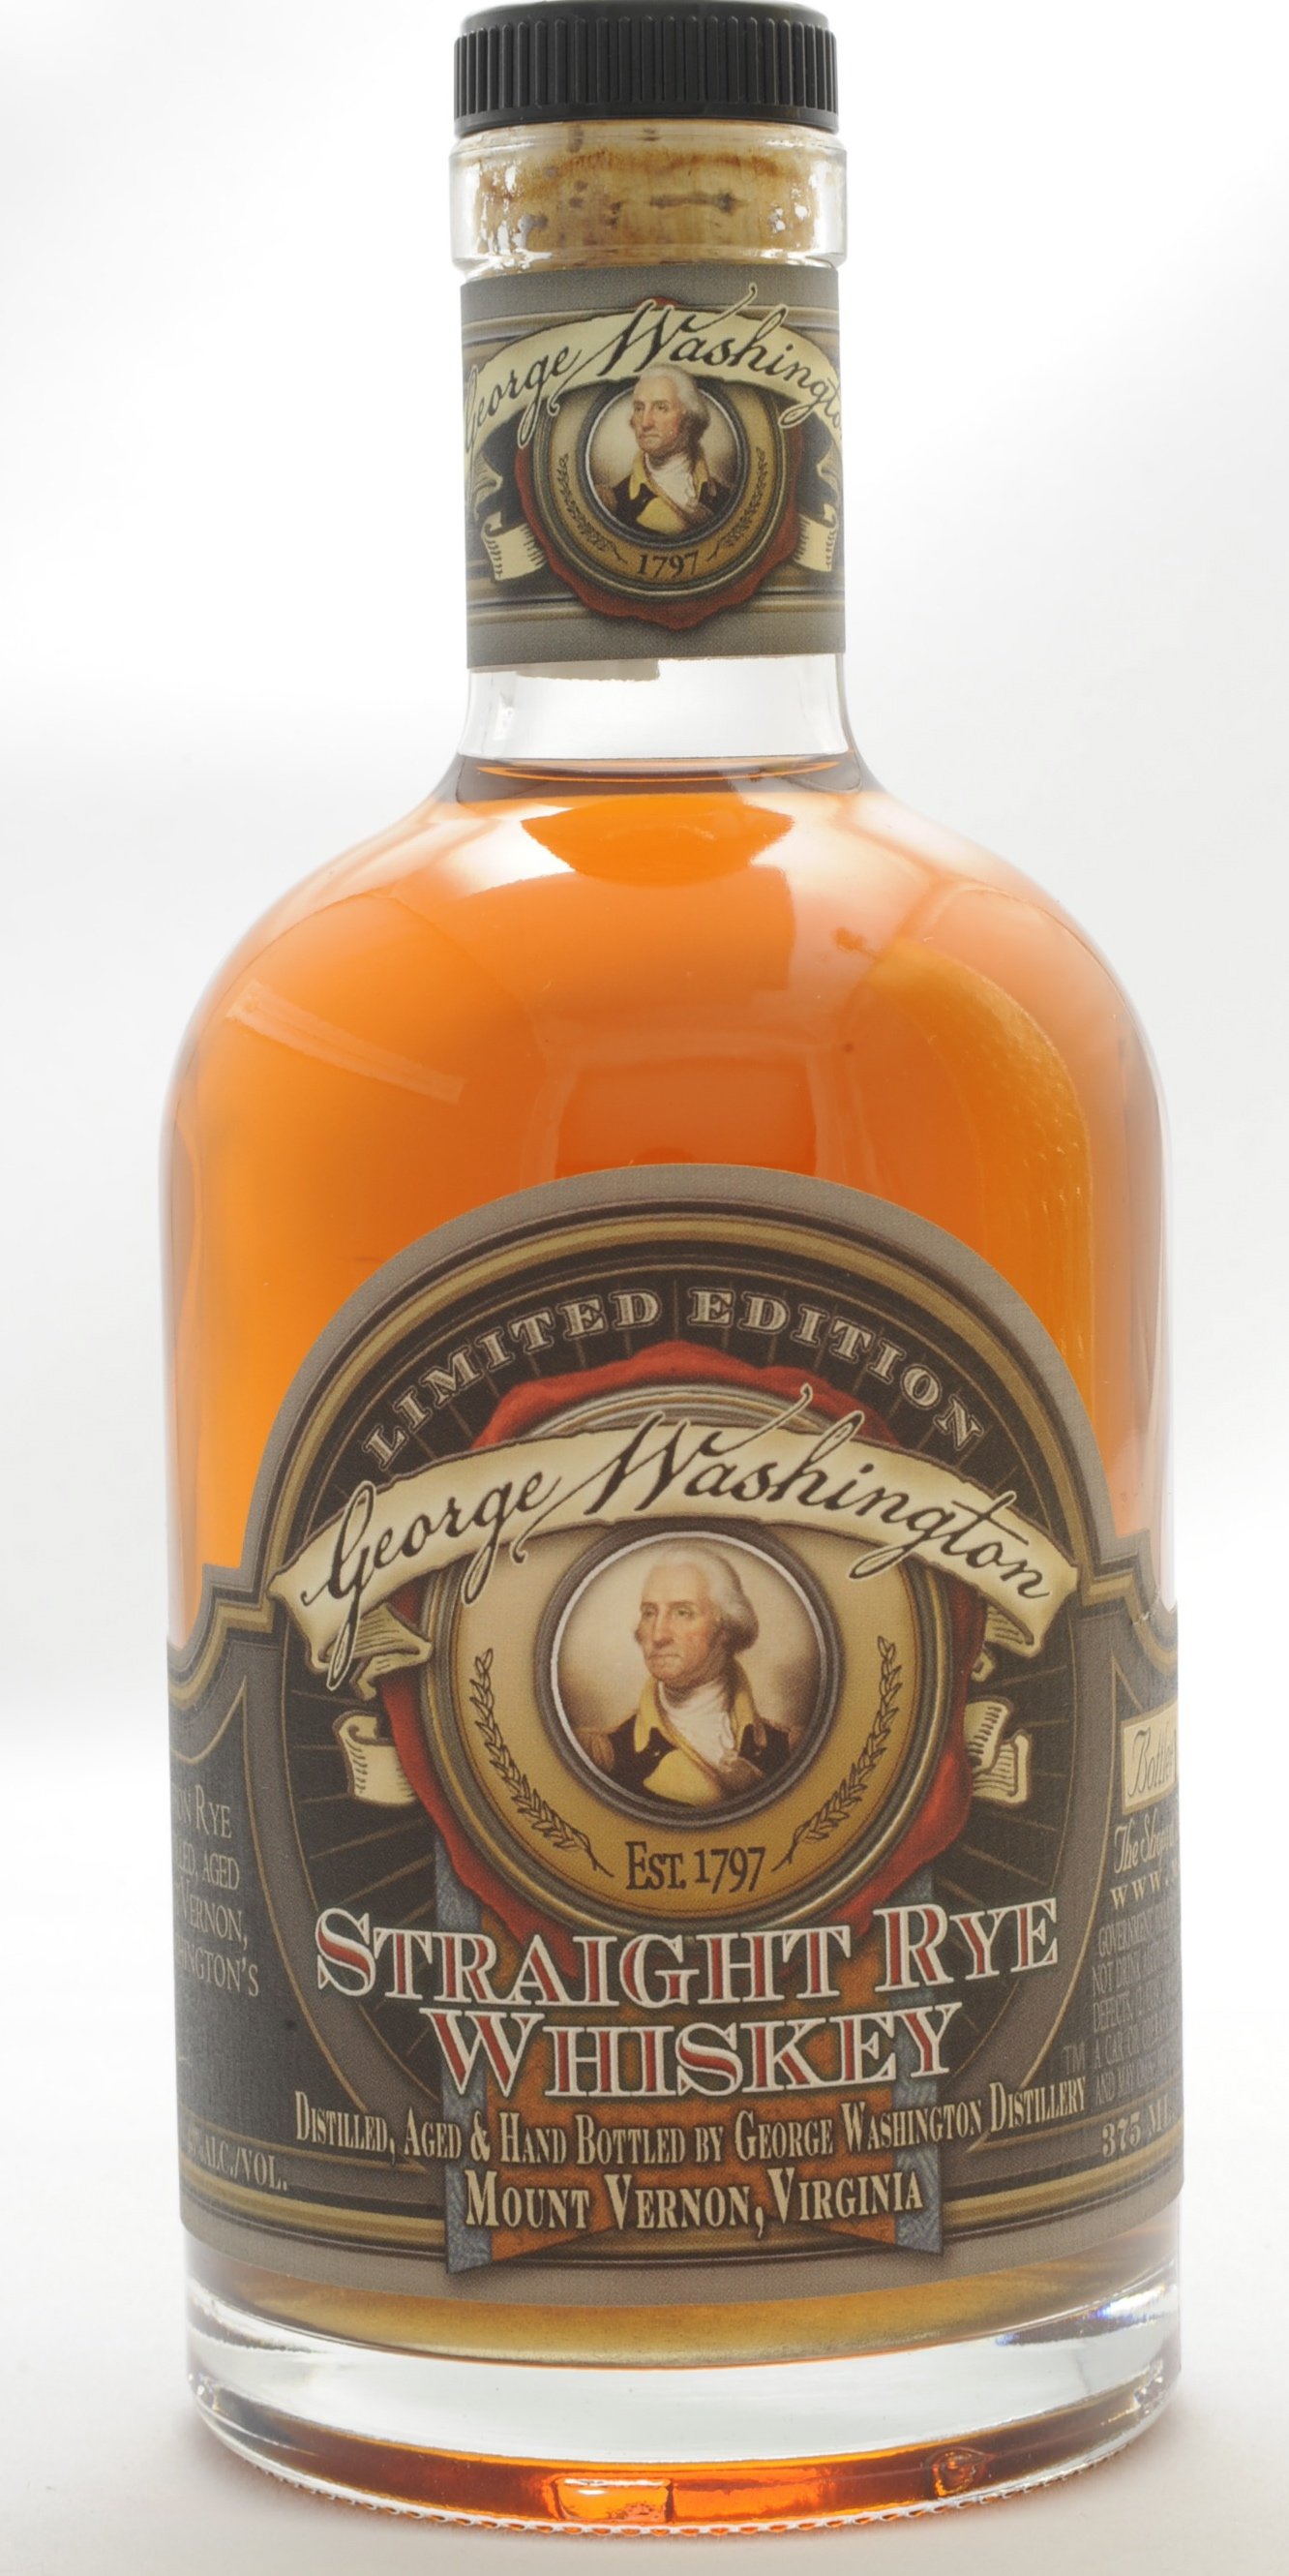 GW whiskey